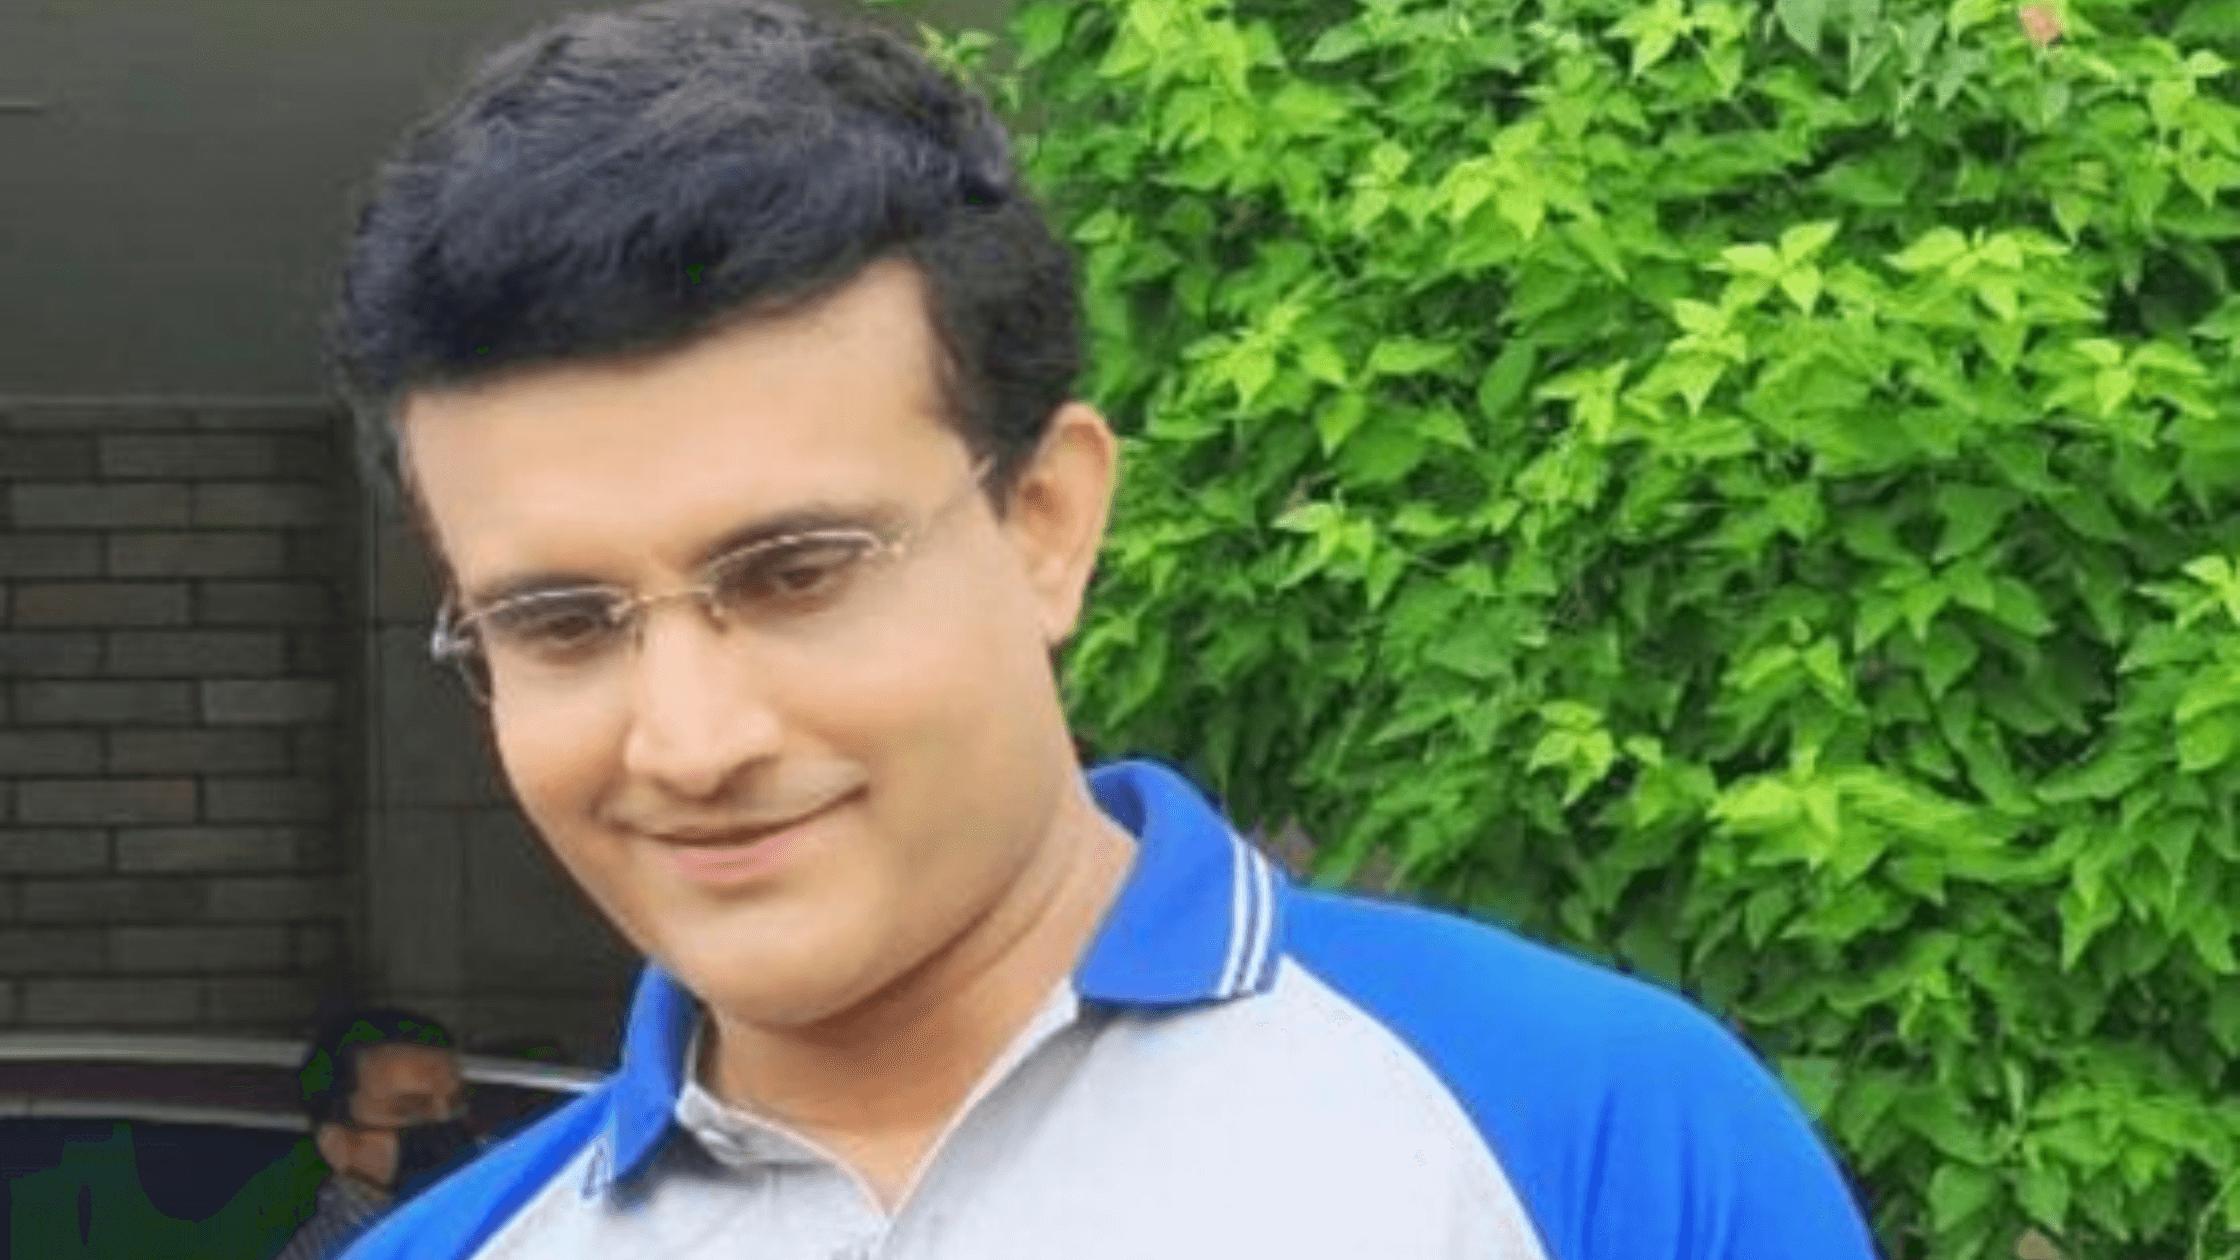 When will domestic cricket begin in India